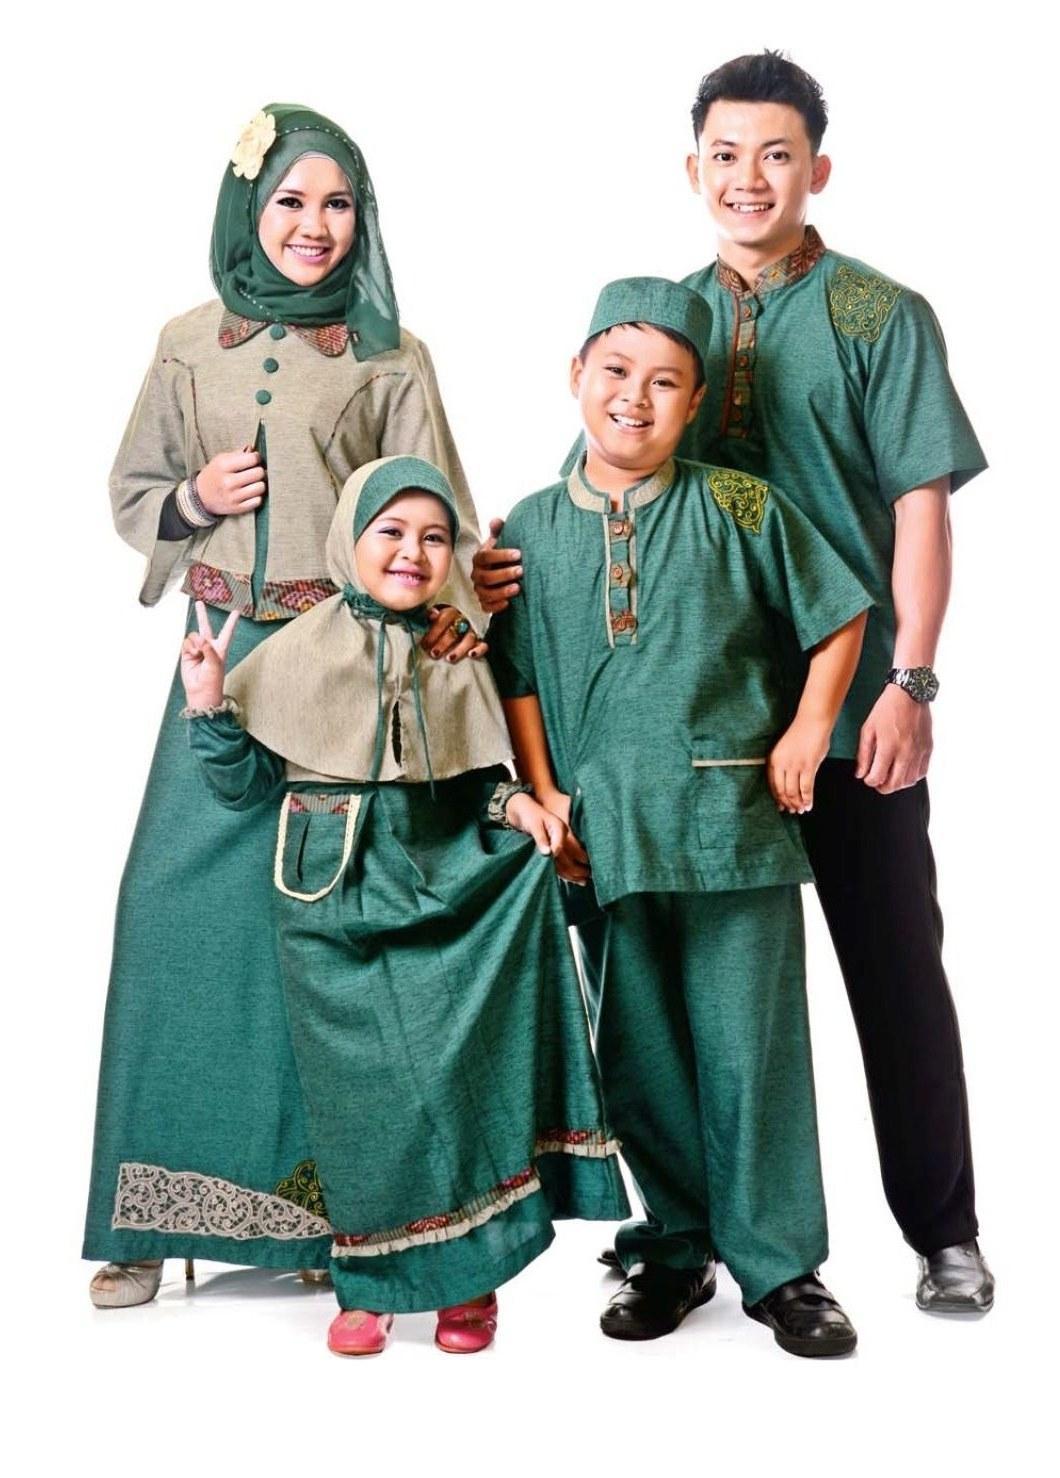 Bentuk Baju Lebaran Keluarga Terbaru Etdg Baju Lebaran Keluarga 2016